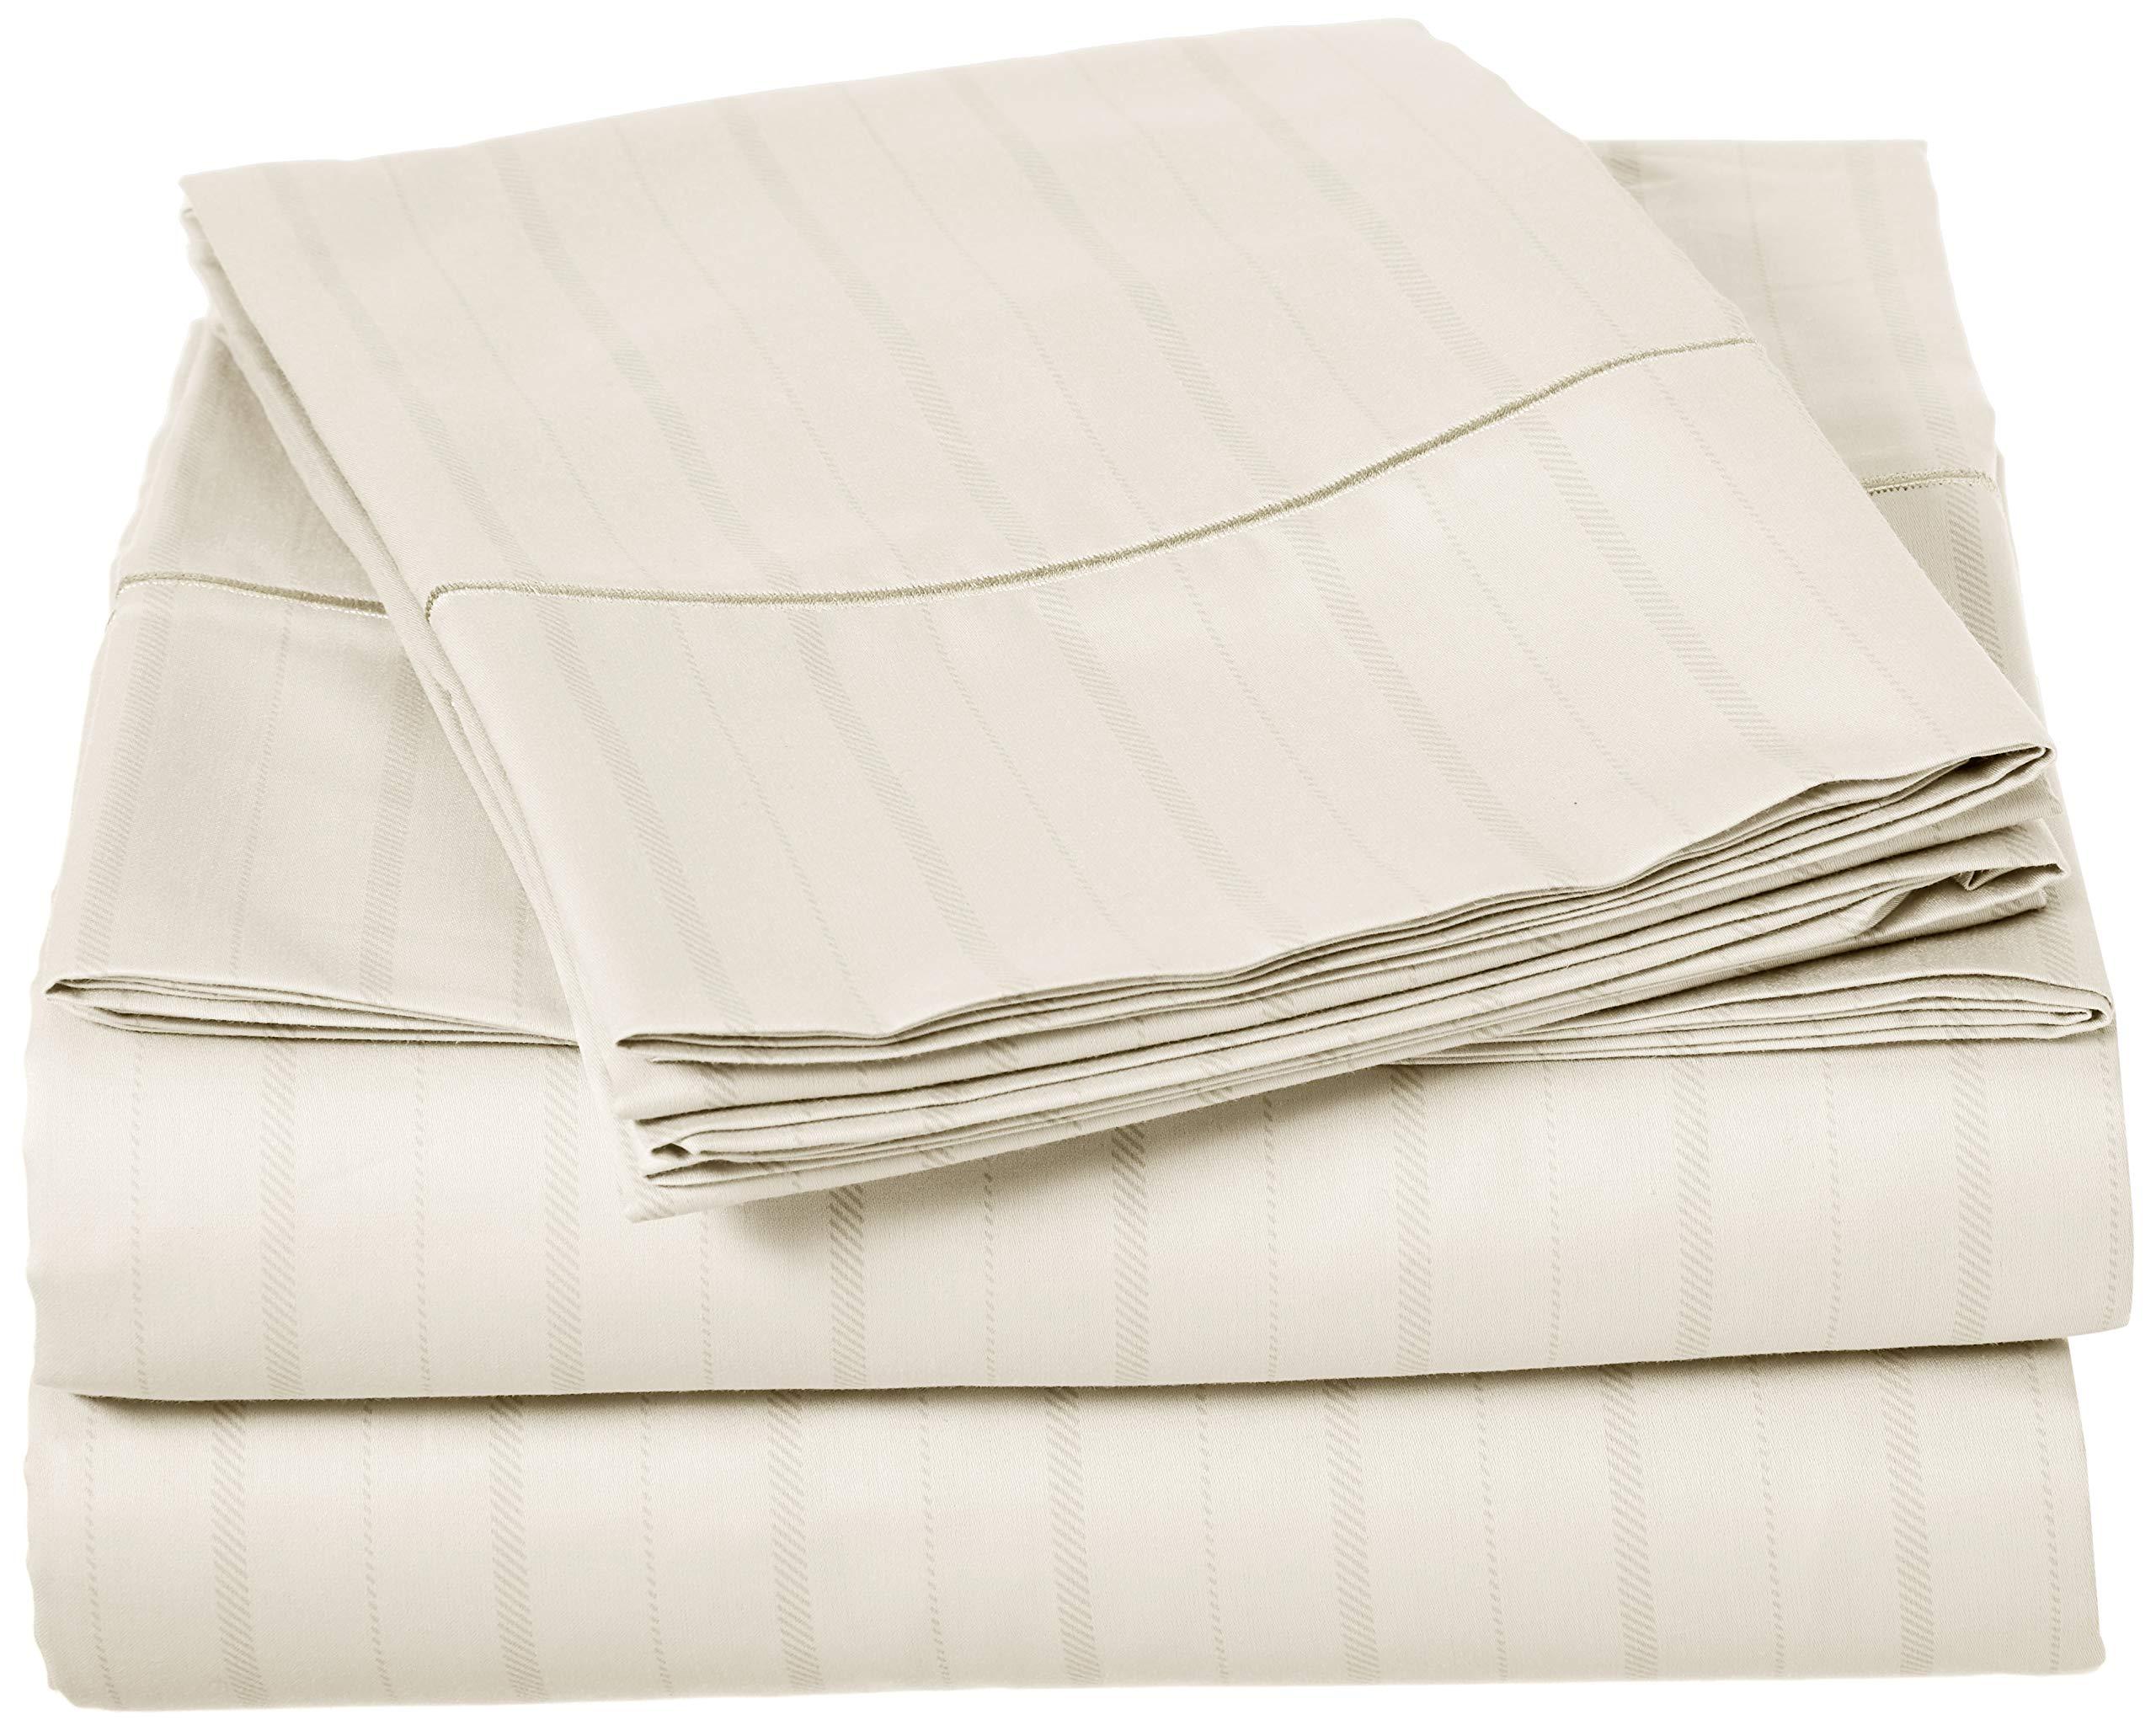 Charisma 310 Thread Count Classic Stripe Cotton Sateen Queen Sheet Set in Almond Milk